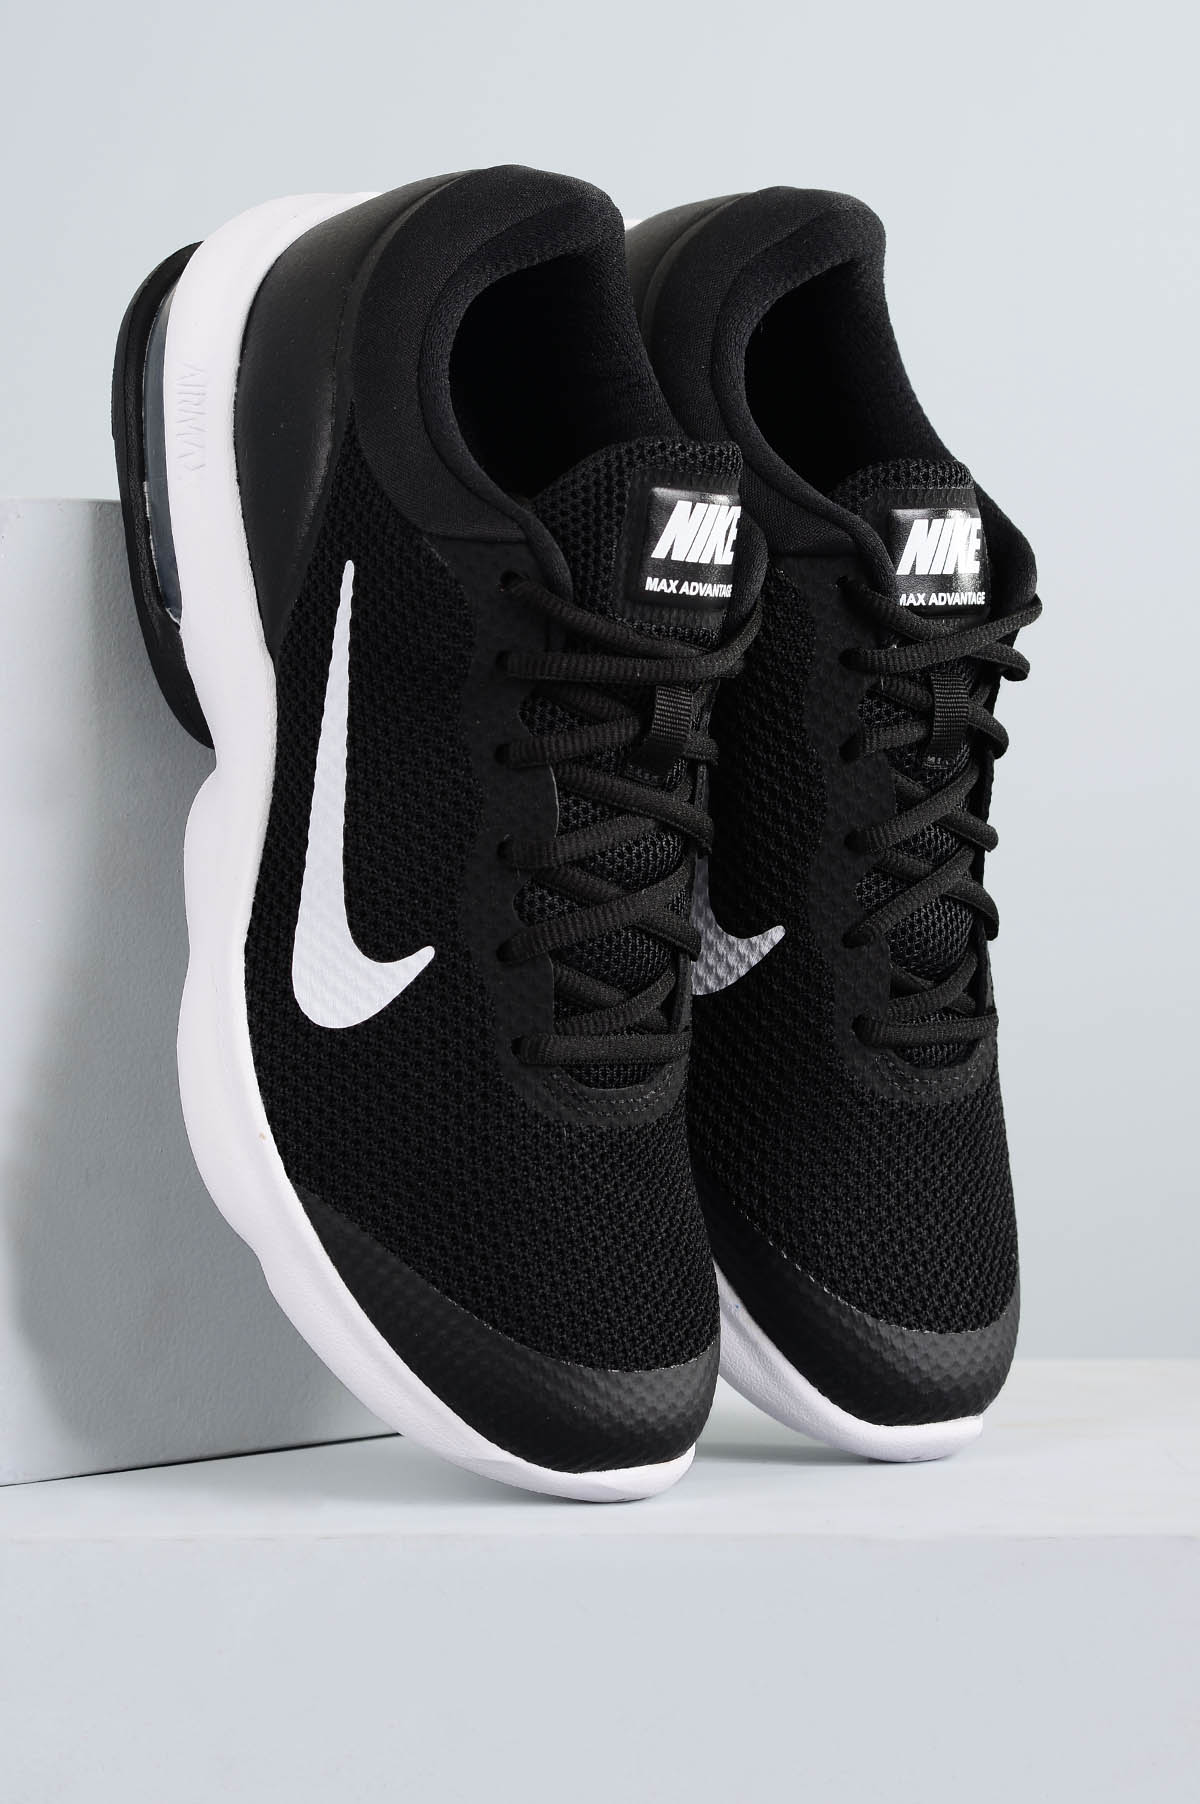 c6145298906 Tênis Masculino Nike Air Max Advantage TEC - PRETO - Mundial Calçados